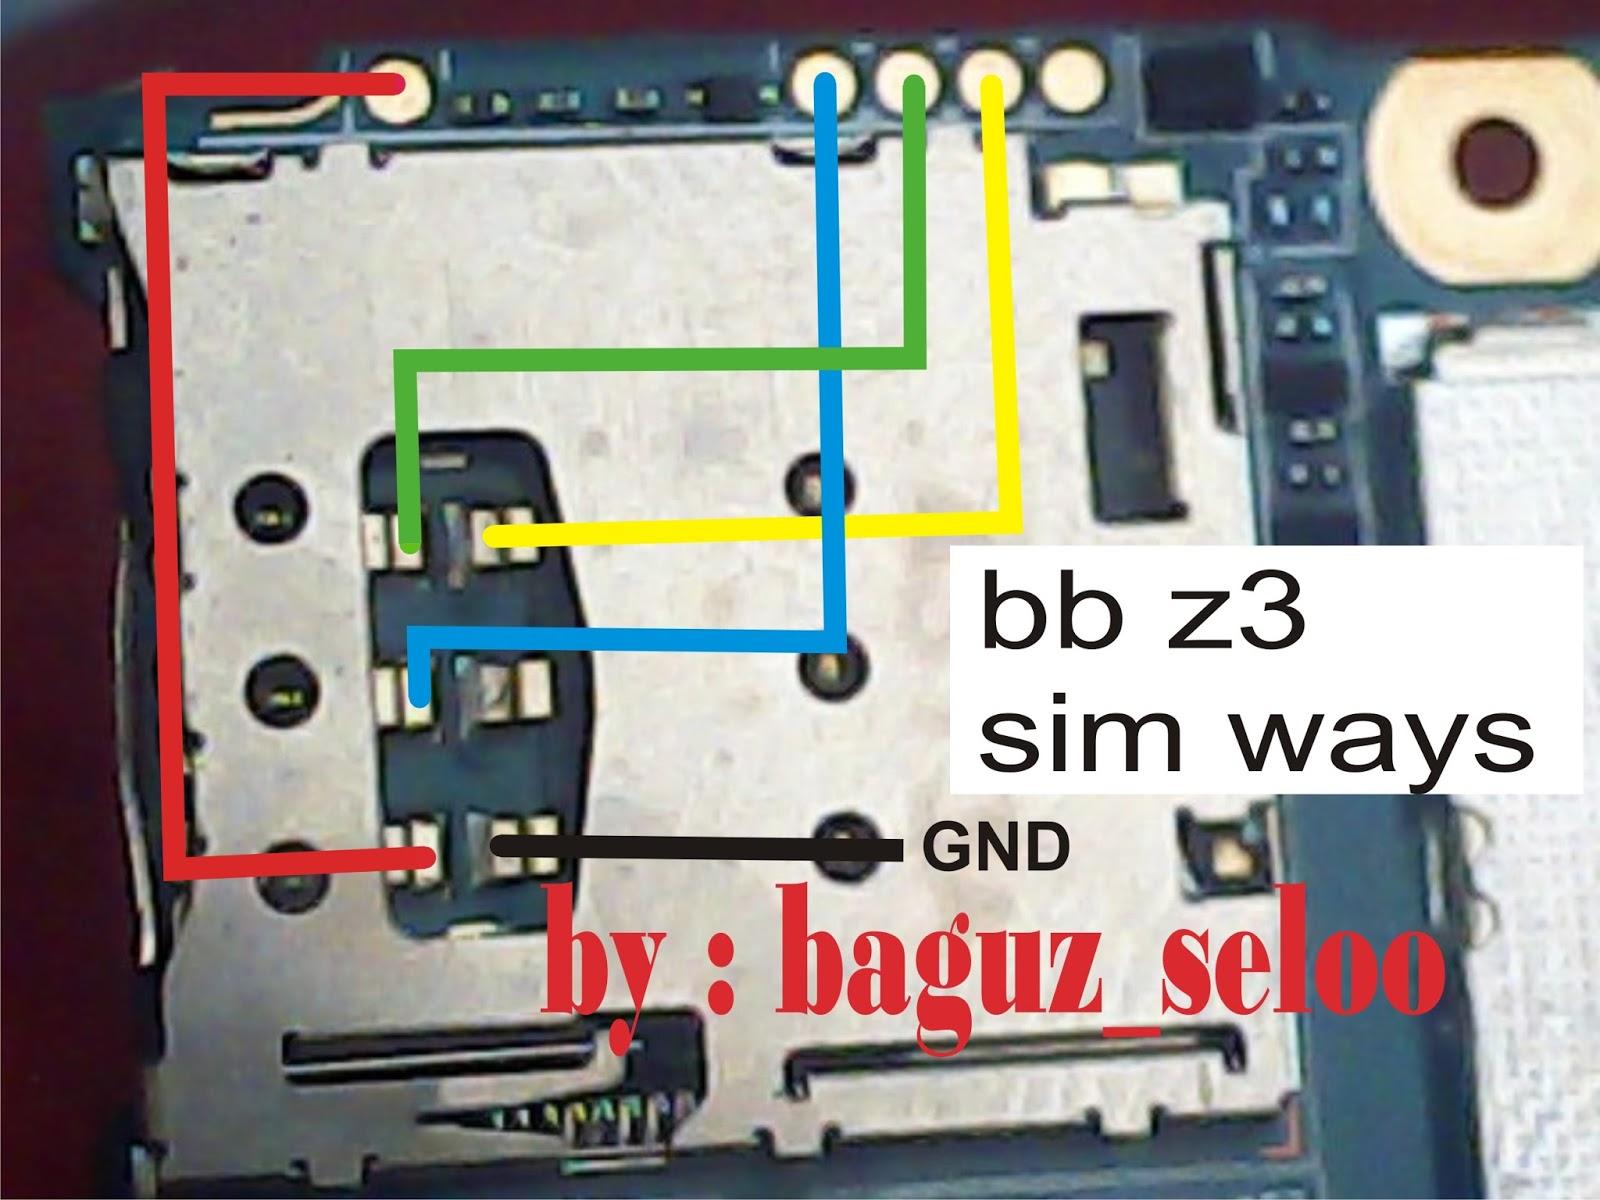 Sony Xperia Z1 No Sim Card Error Problem Solution - Imagez co